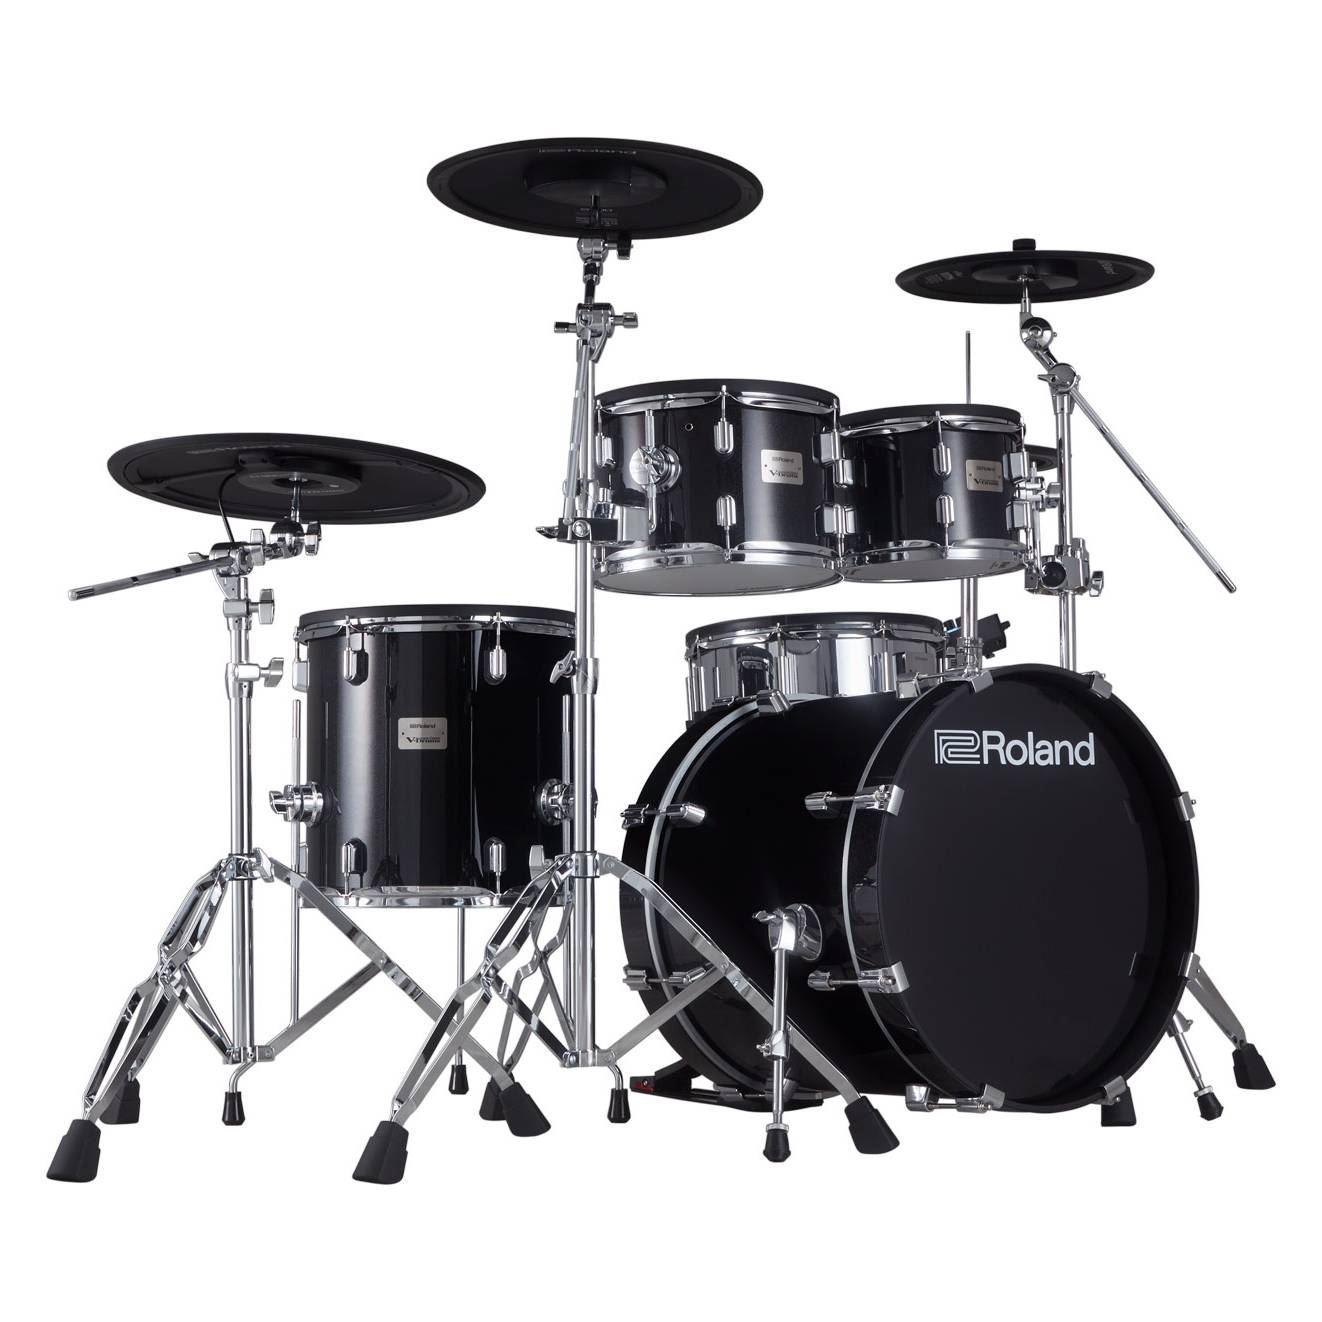 3x Tom Mount Bracket Rack Clamp Percussion Ständer Für Tom Drum Arms Percussion